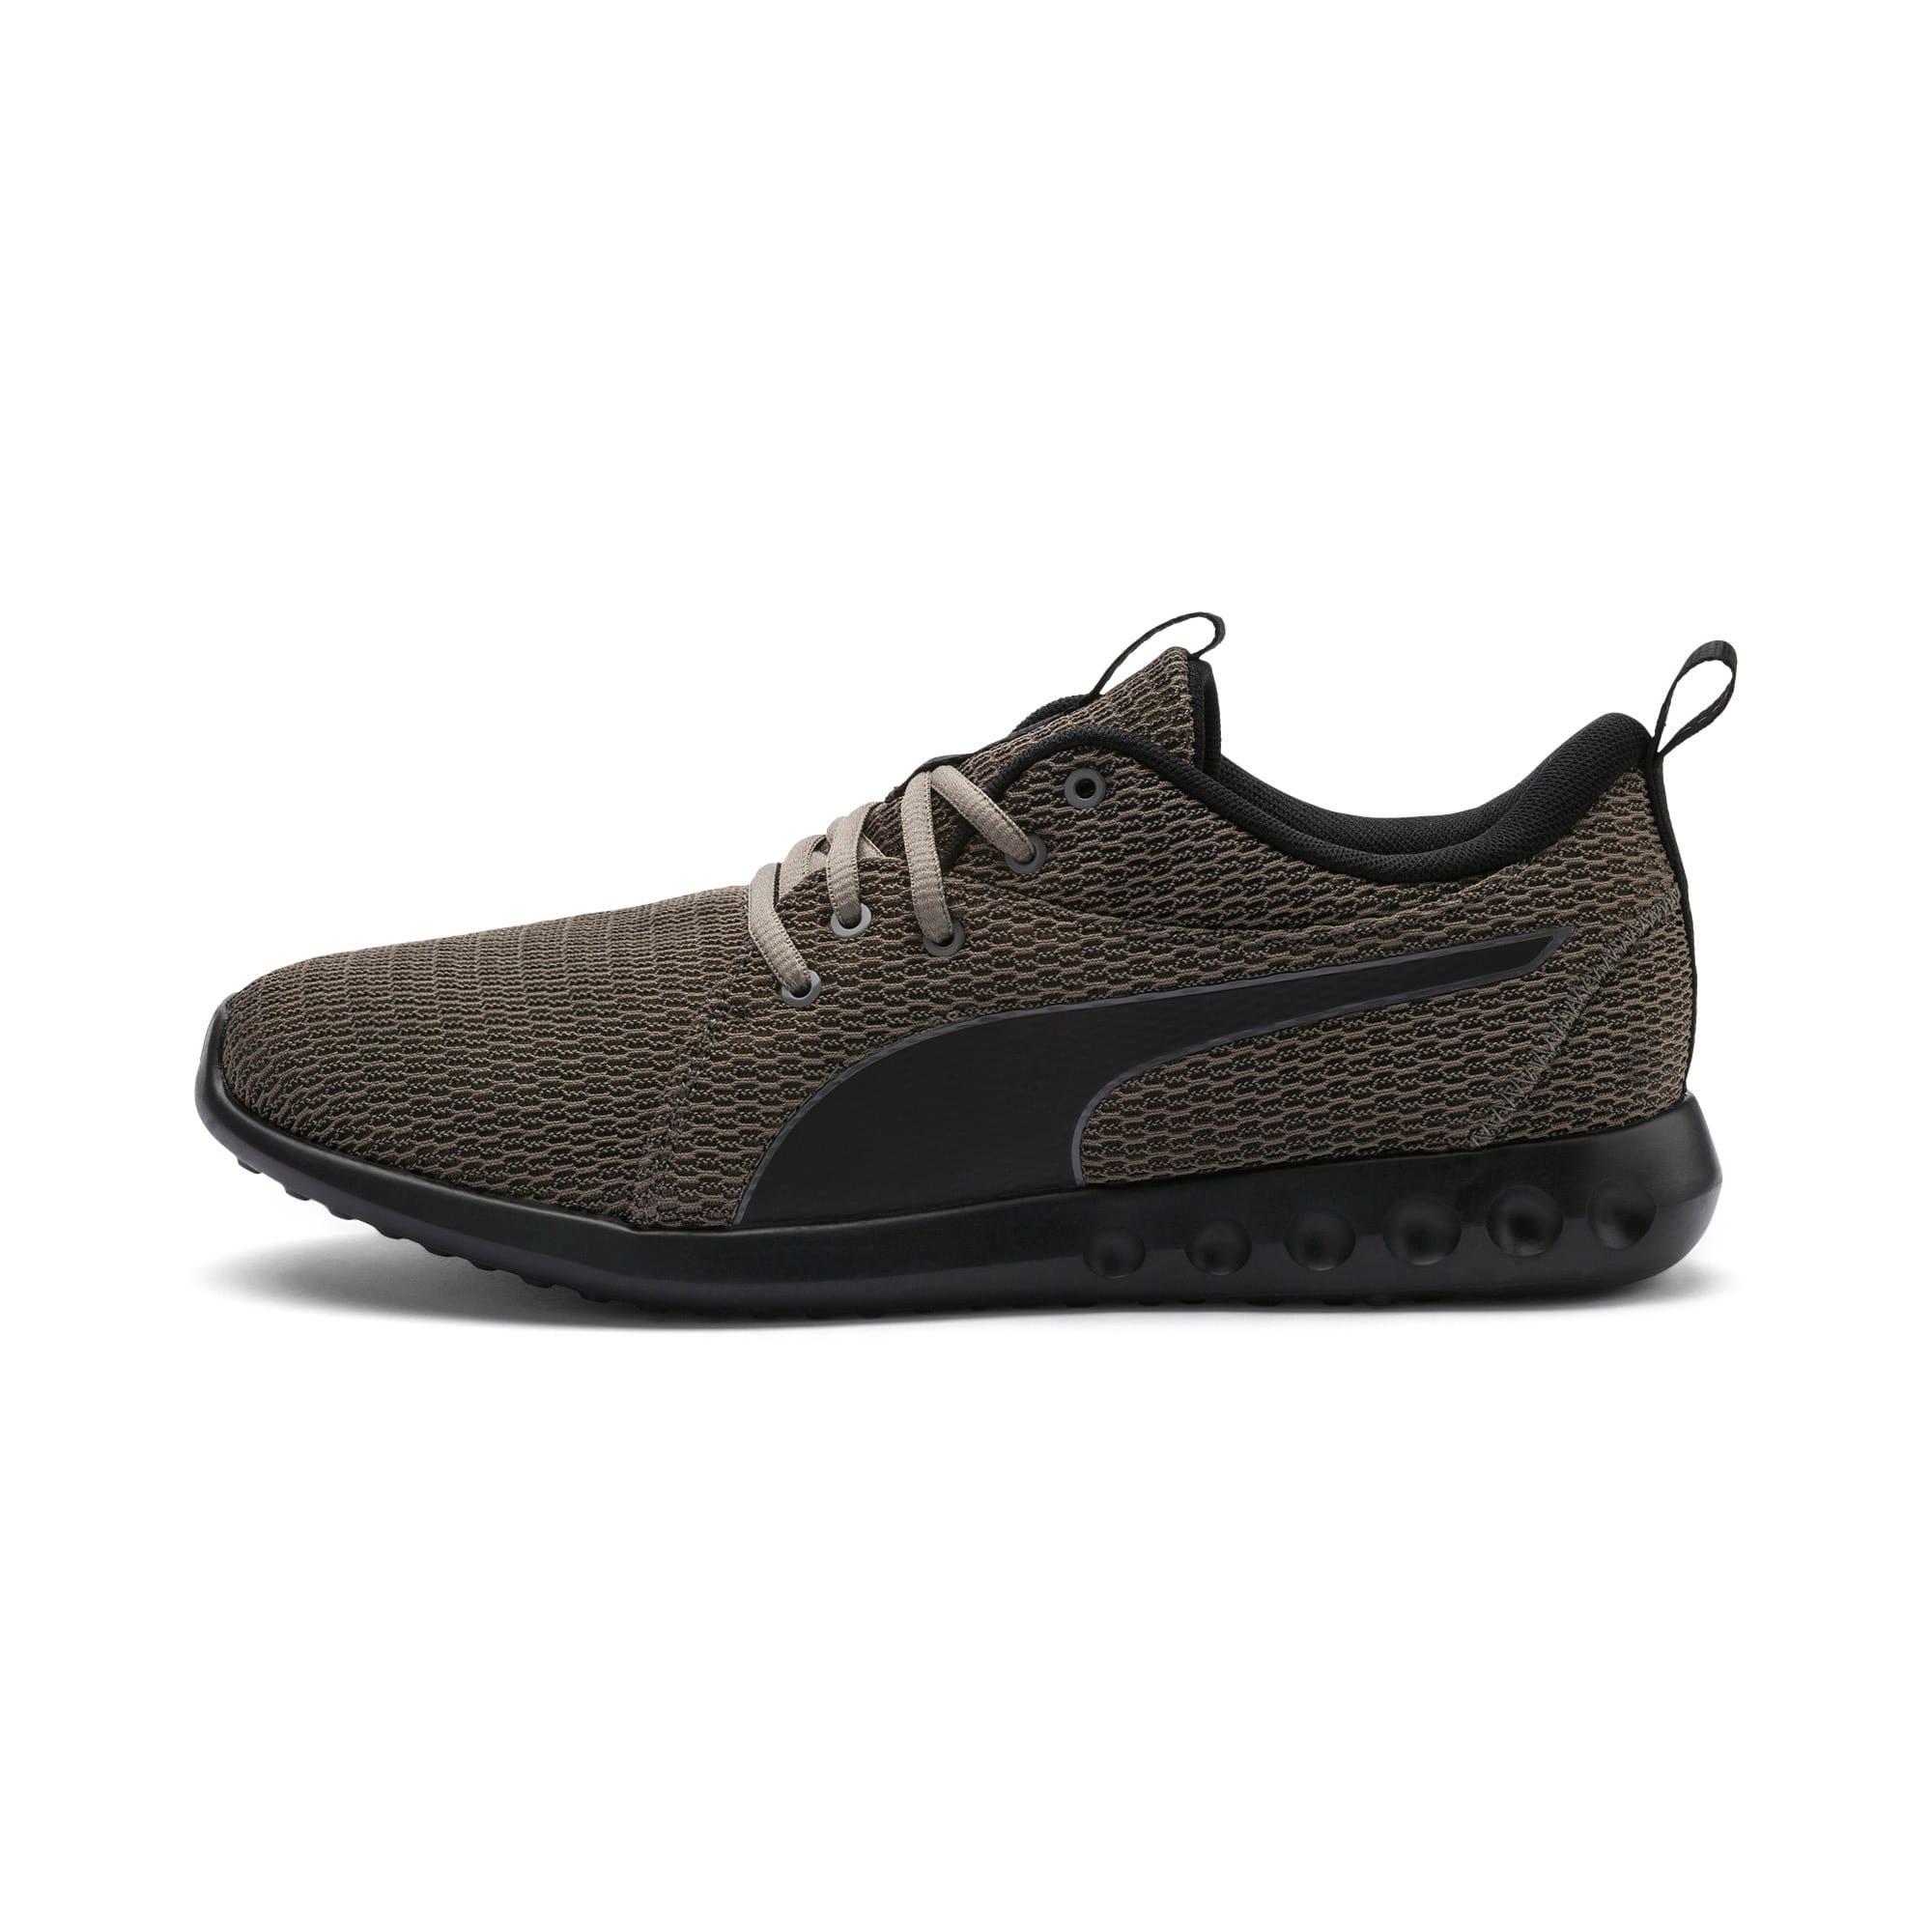 Miniatura 1 de Zapatos para correrCarson 2 New Corepara hombre, Charcoal Gray-Puma Black, mediano